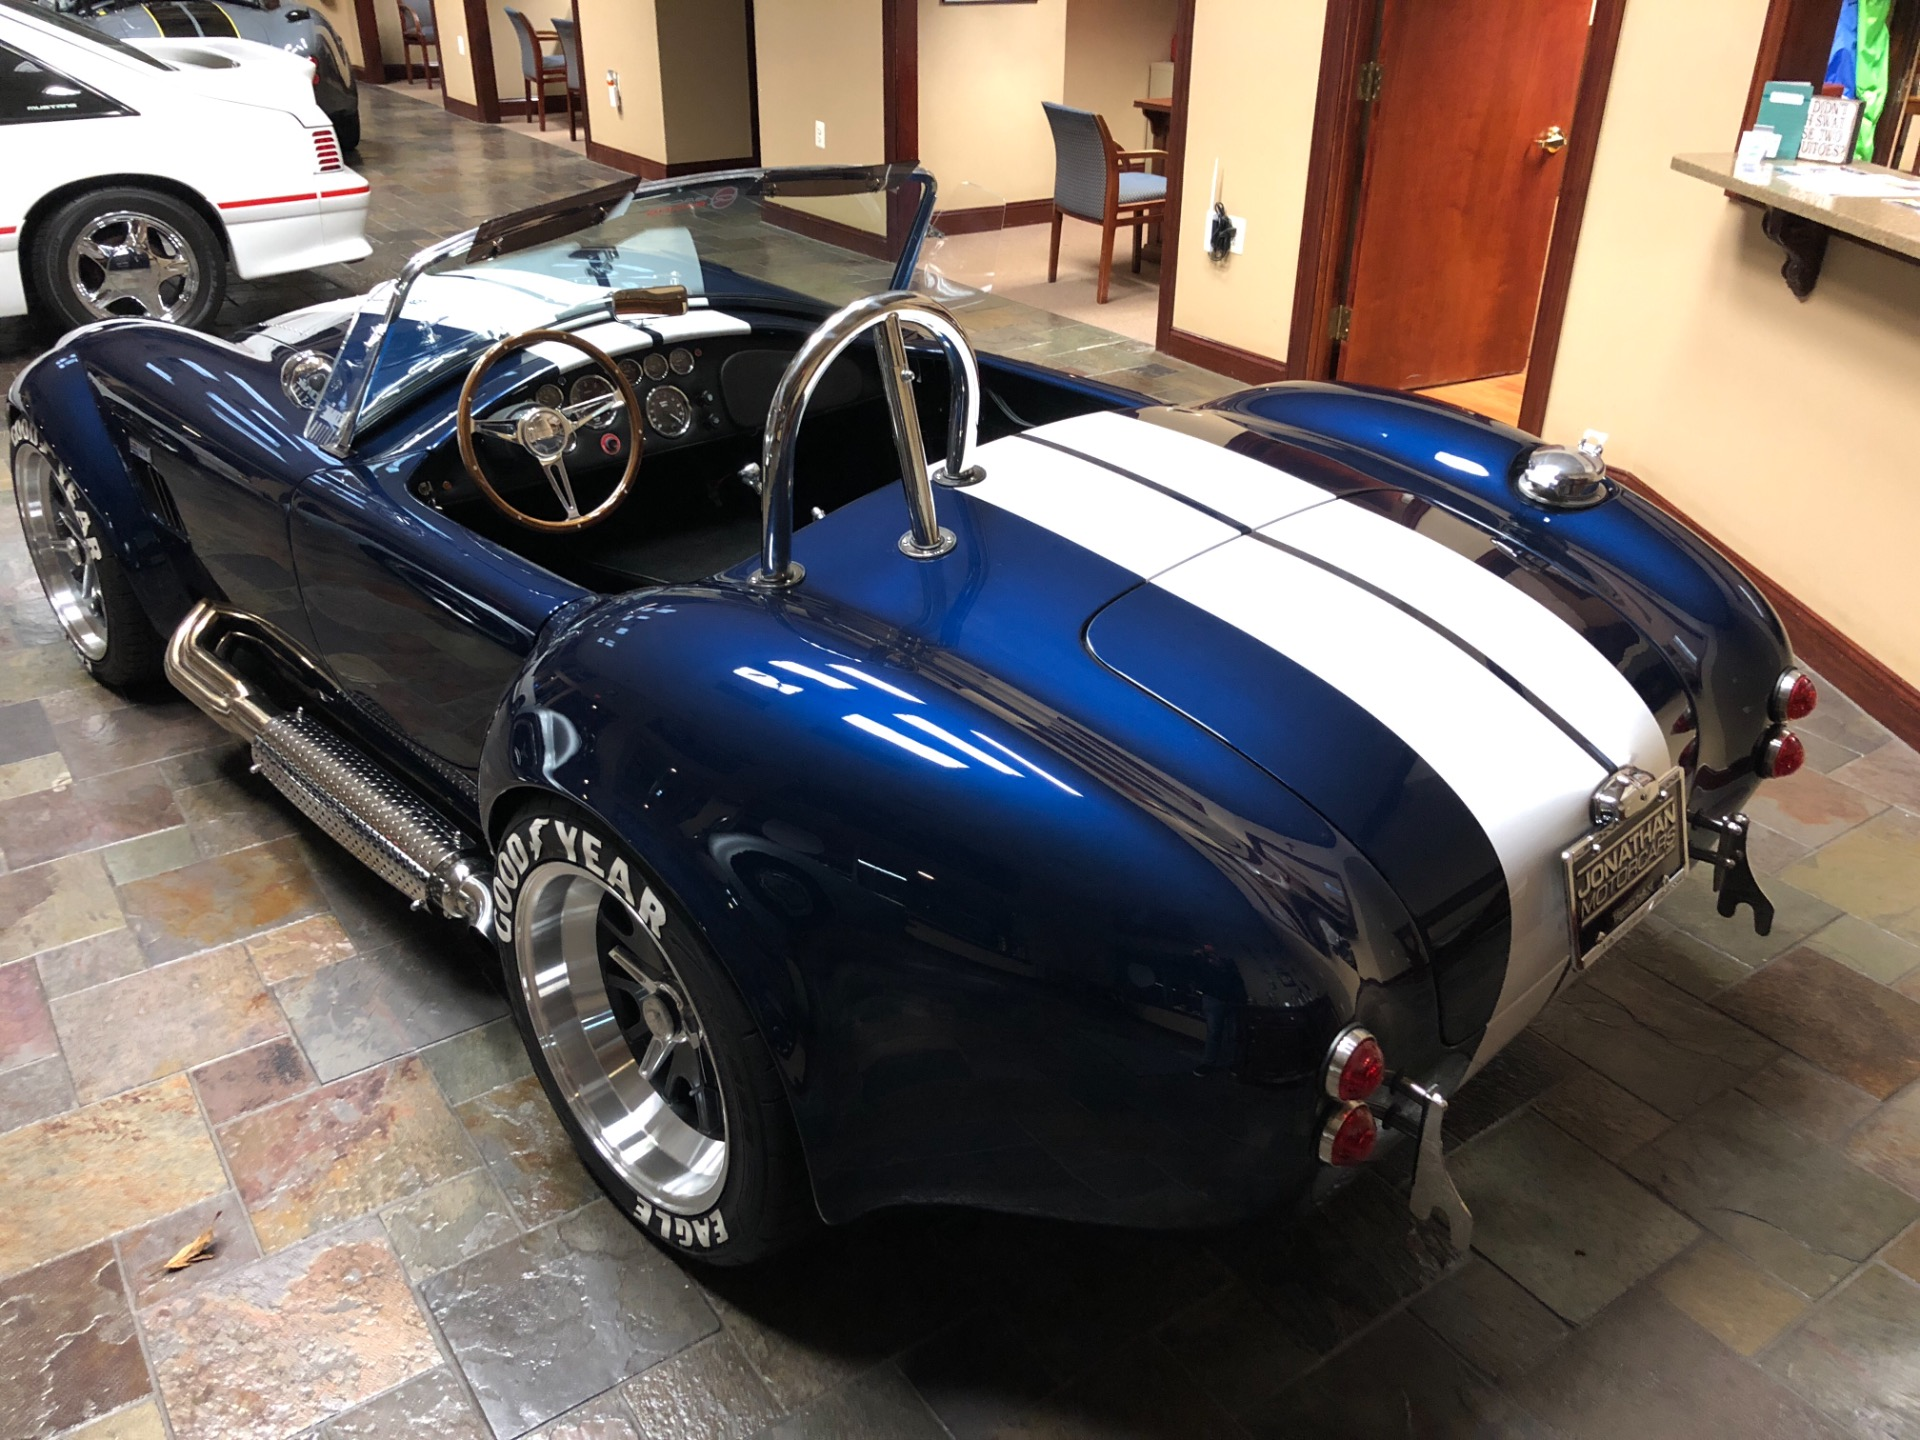 New-1965-Backdraft-Racing-Cobra-Roadster-Big-&-Tall-Edition